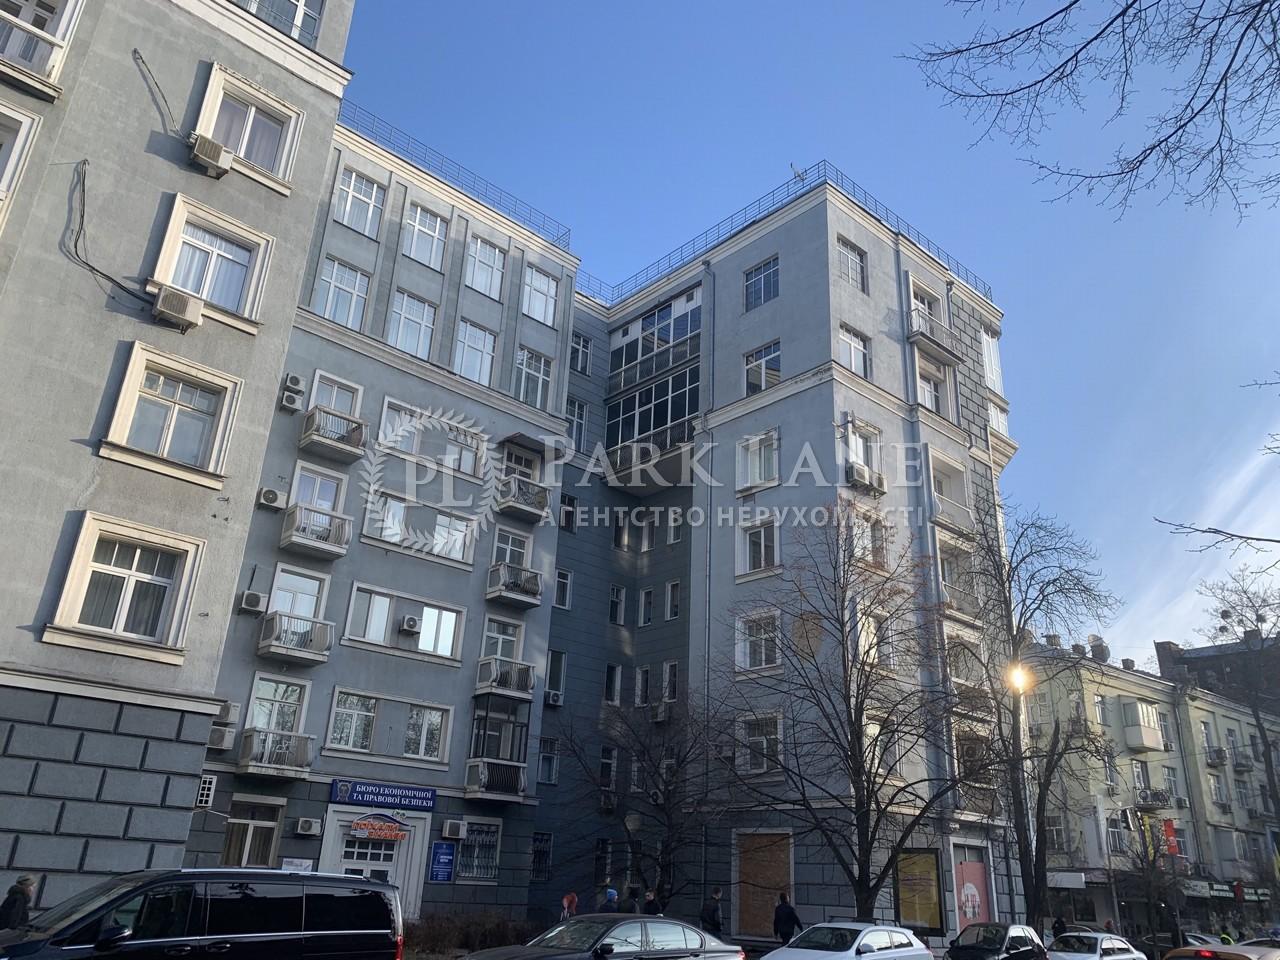 Квартира K-28587, Институтская, 15/5, Киев - Фото 21